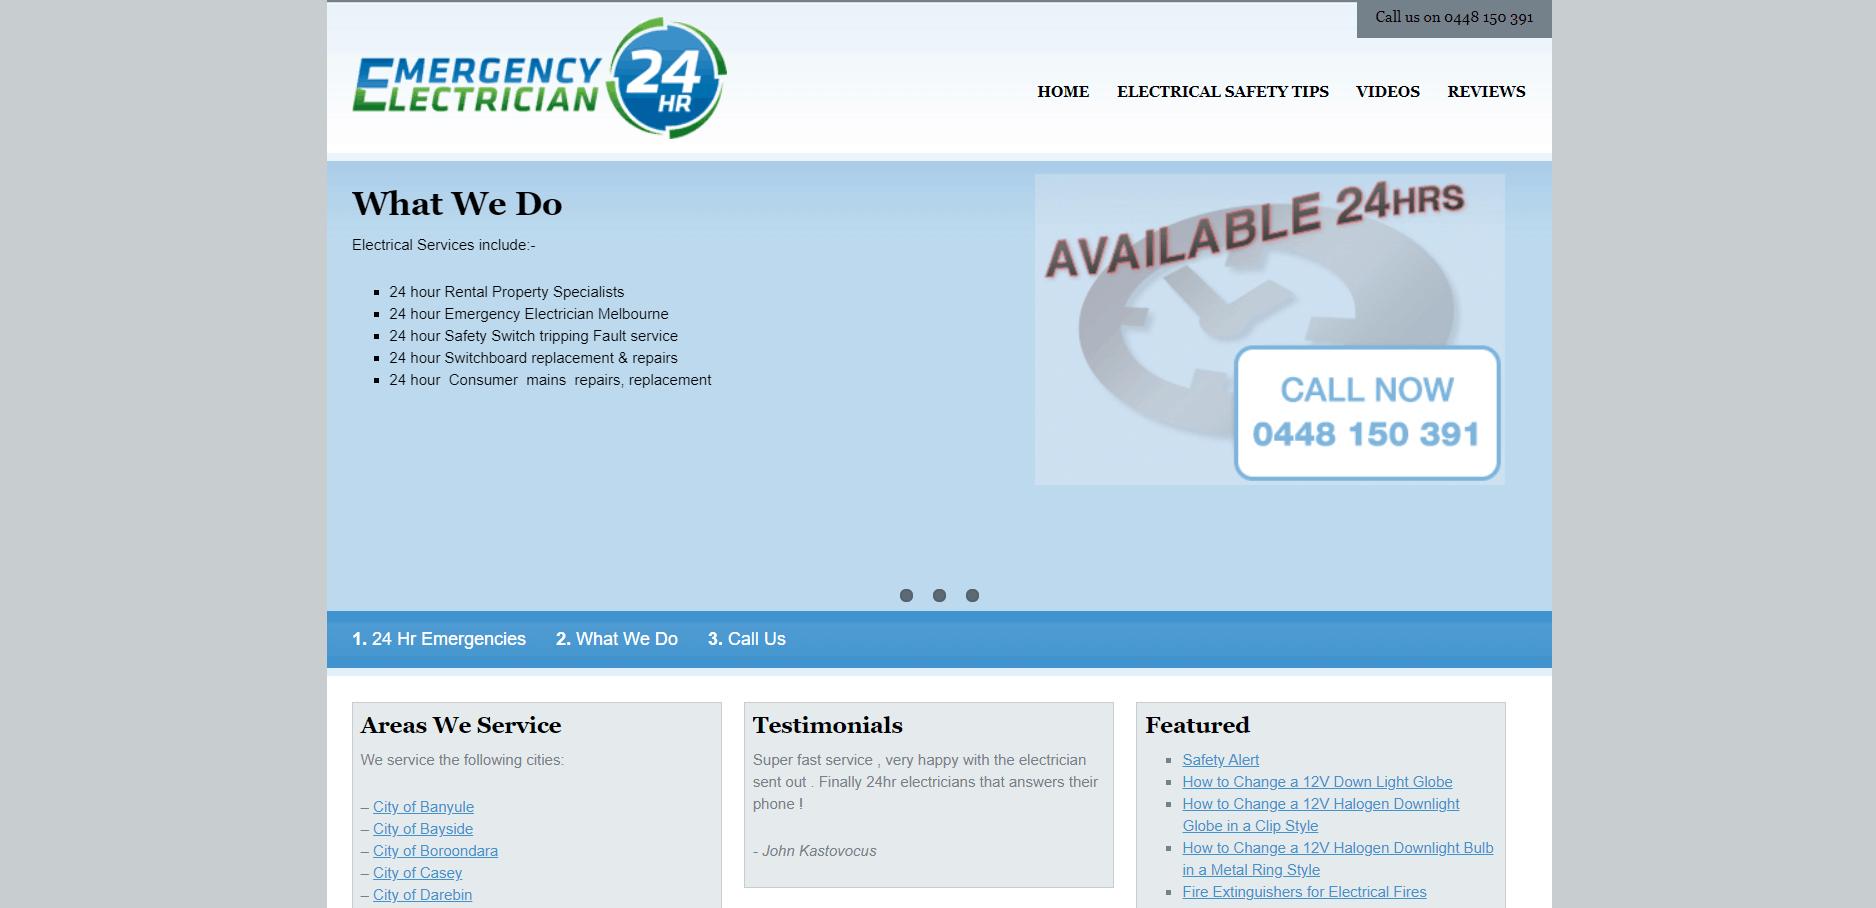 Emergency Electrician 24 Hr